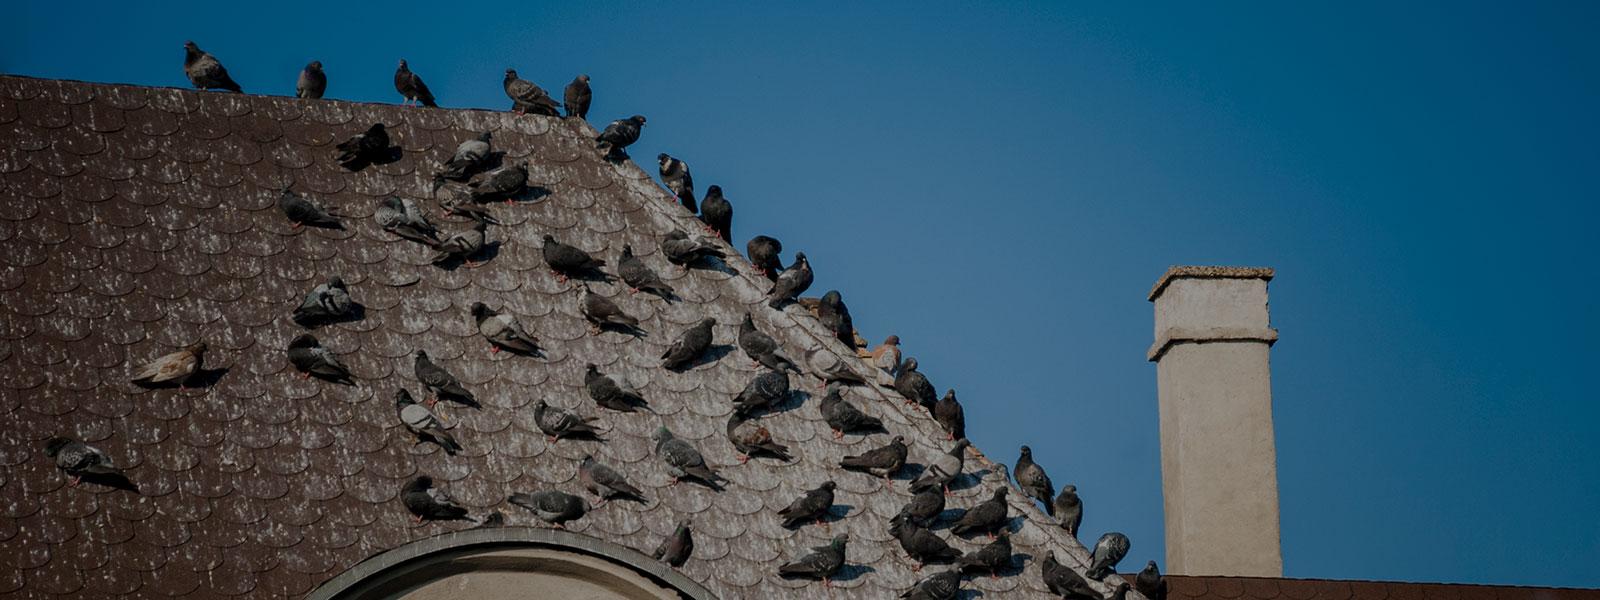 Birds On Roof